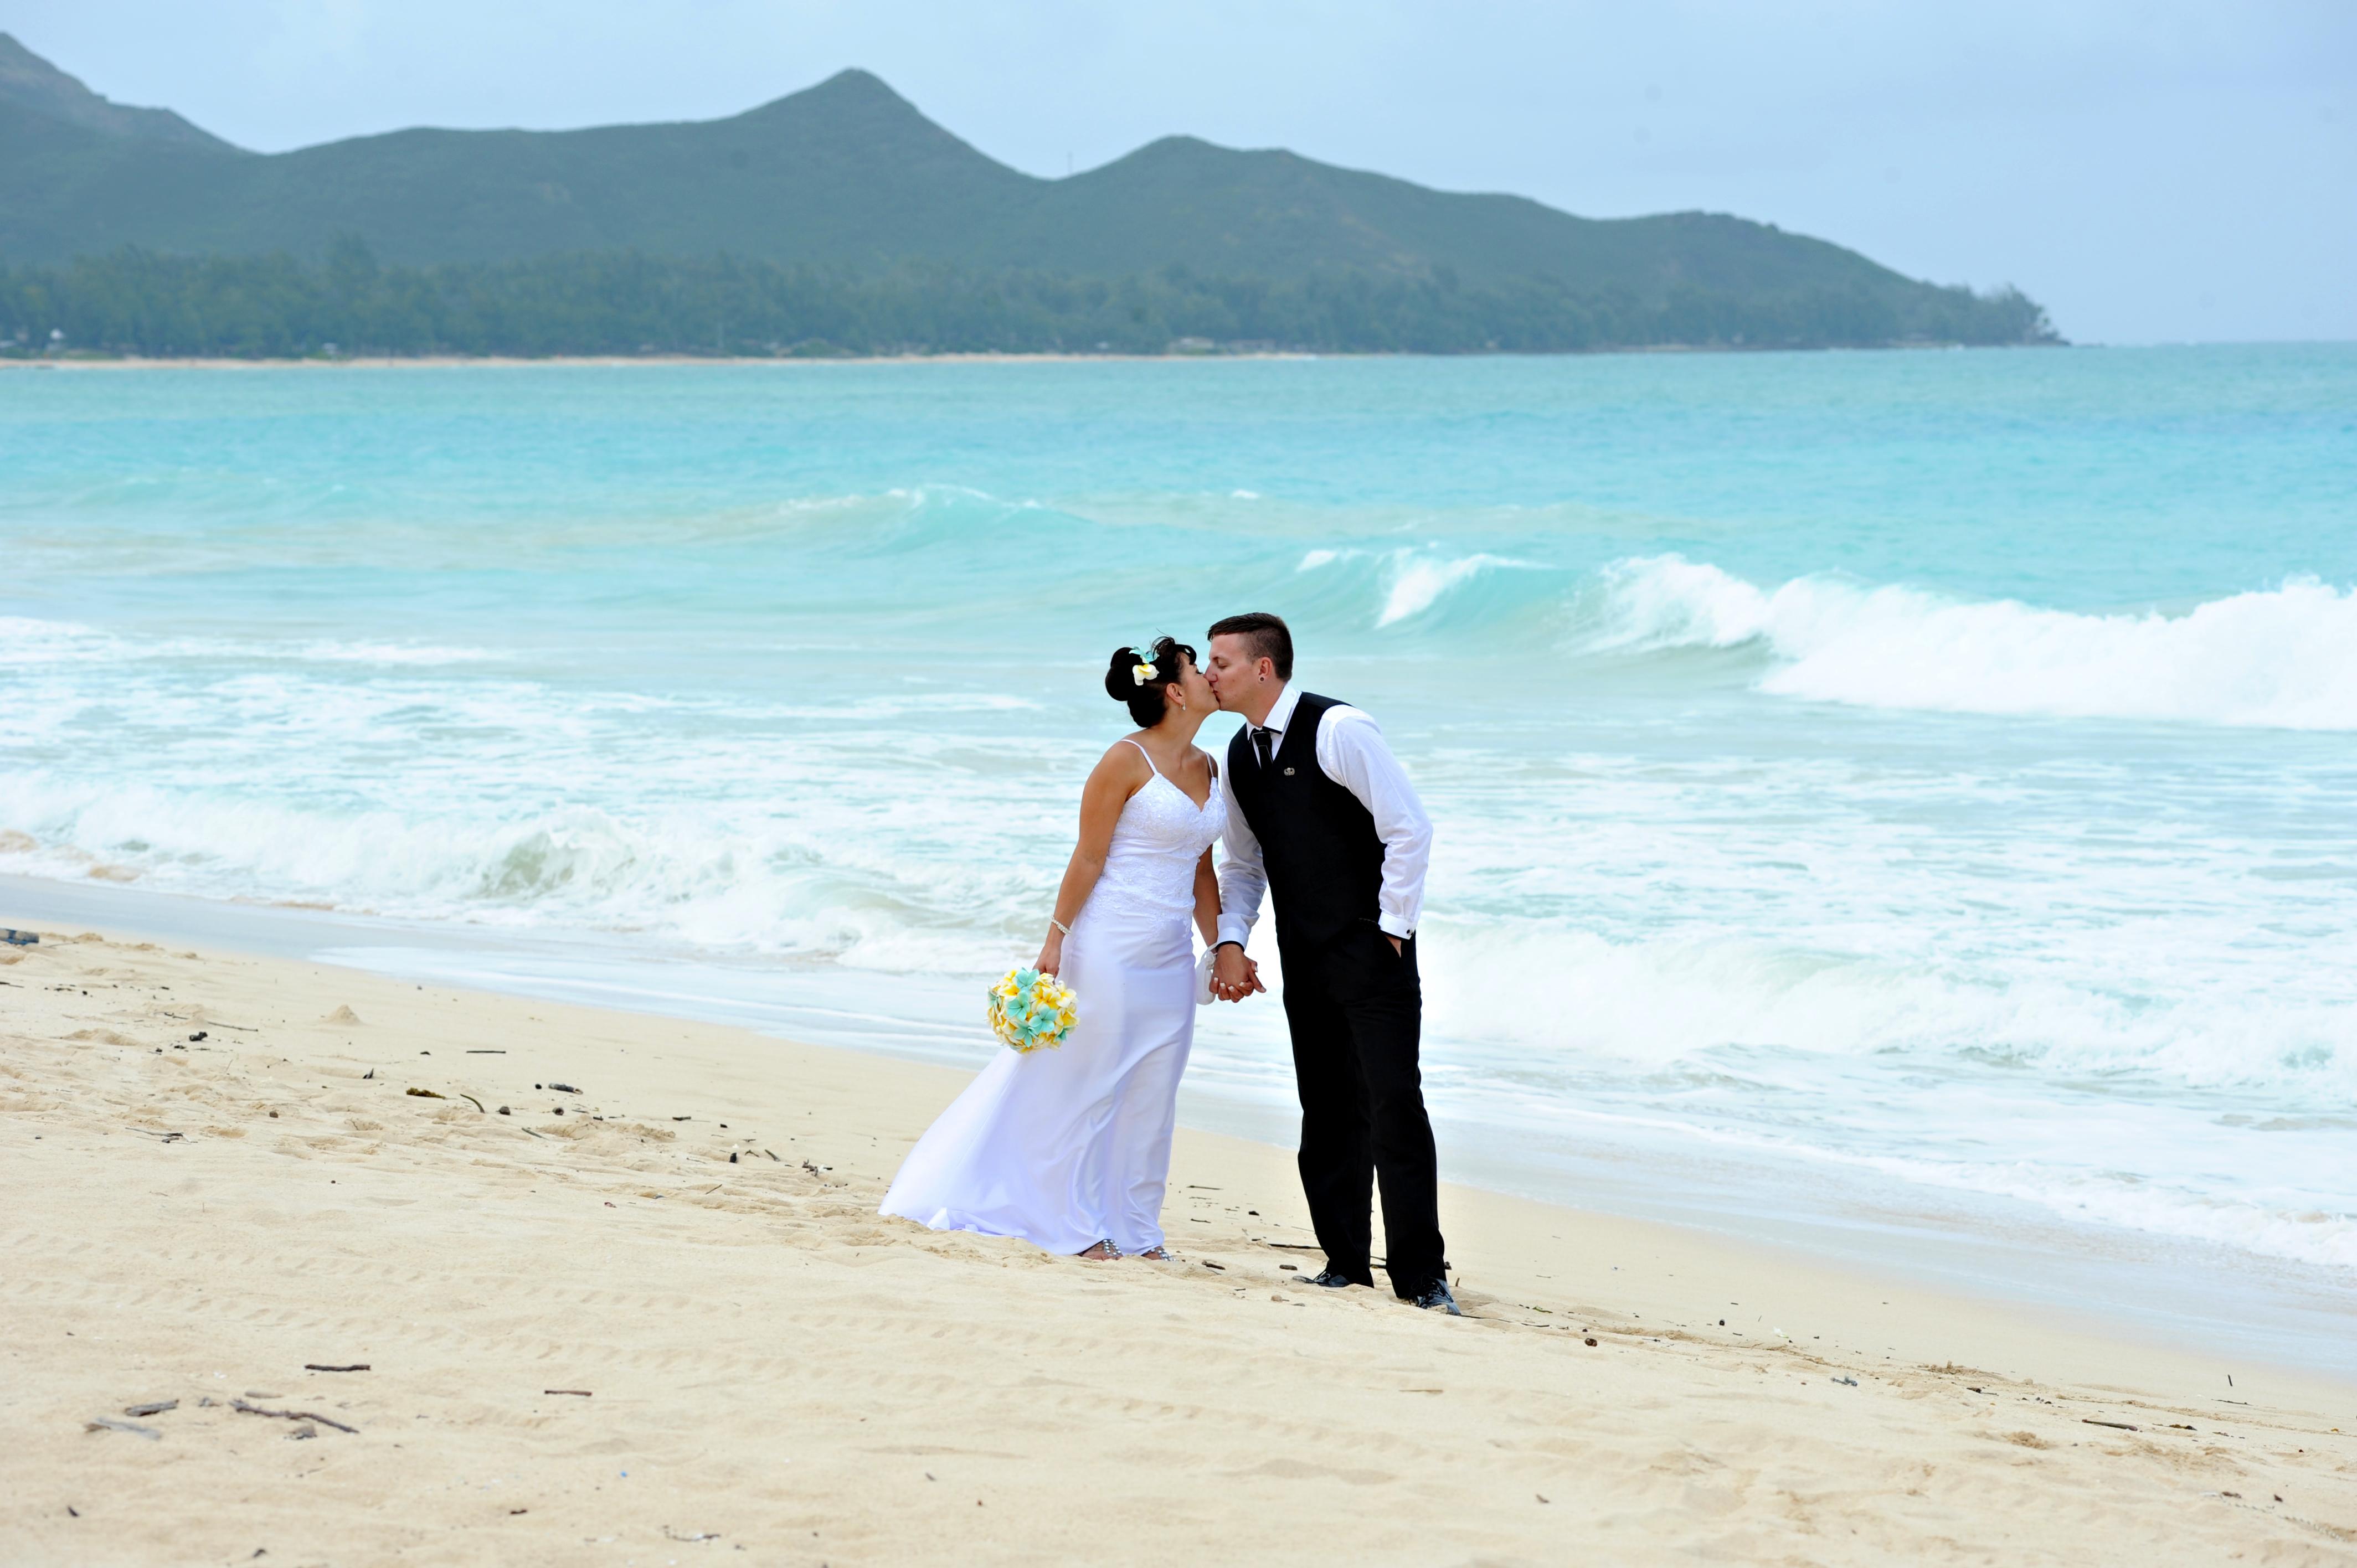 Alohaislandweddings.com- Wedding Picture in Hawaii-36